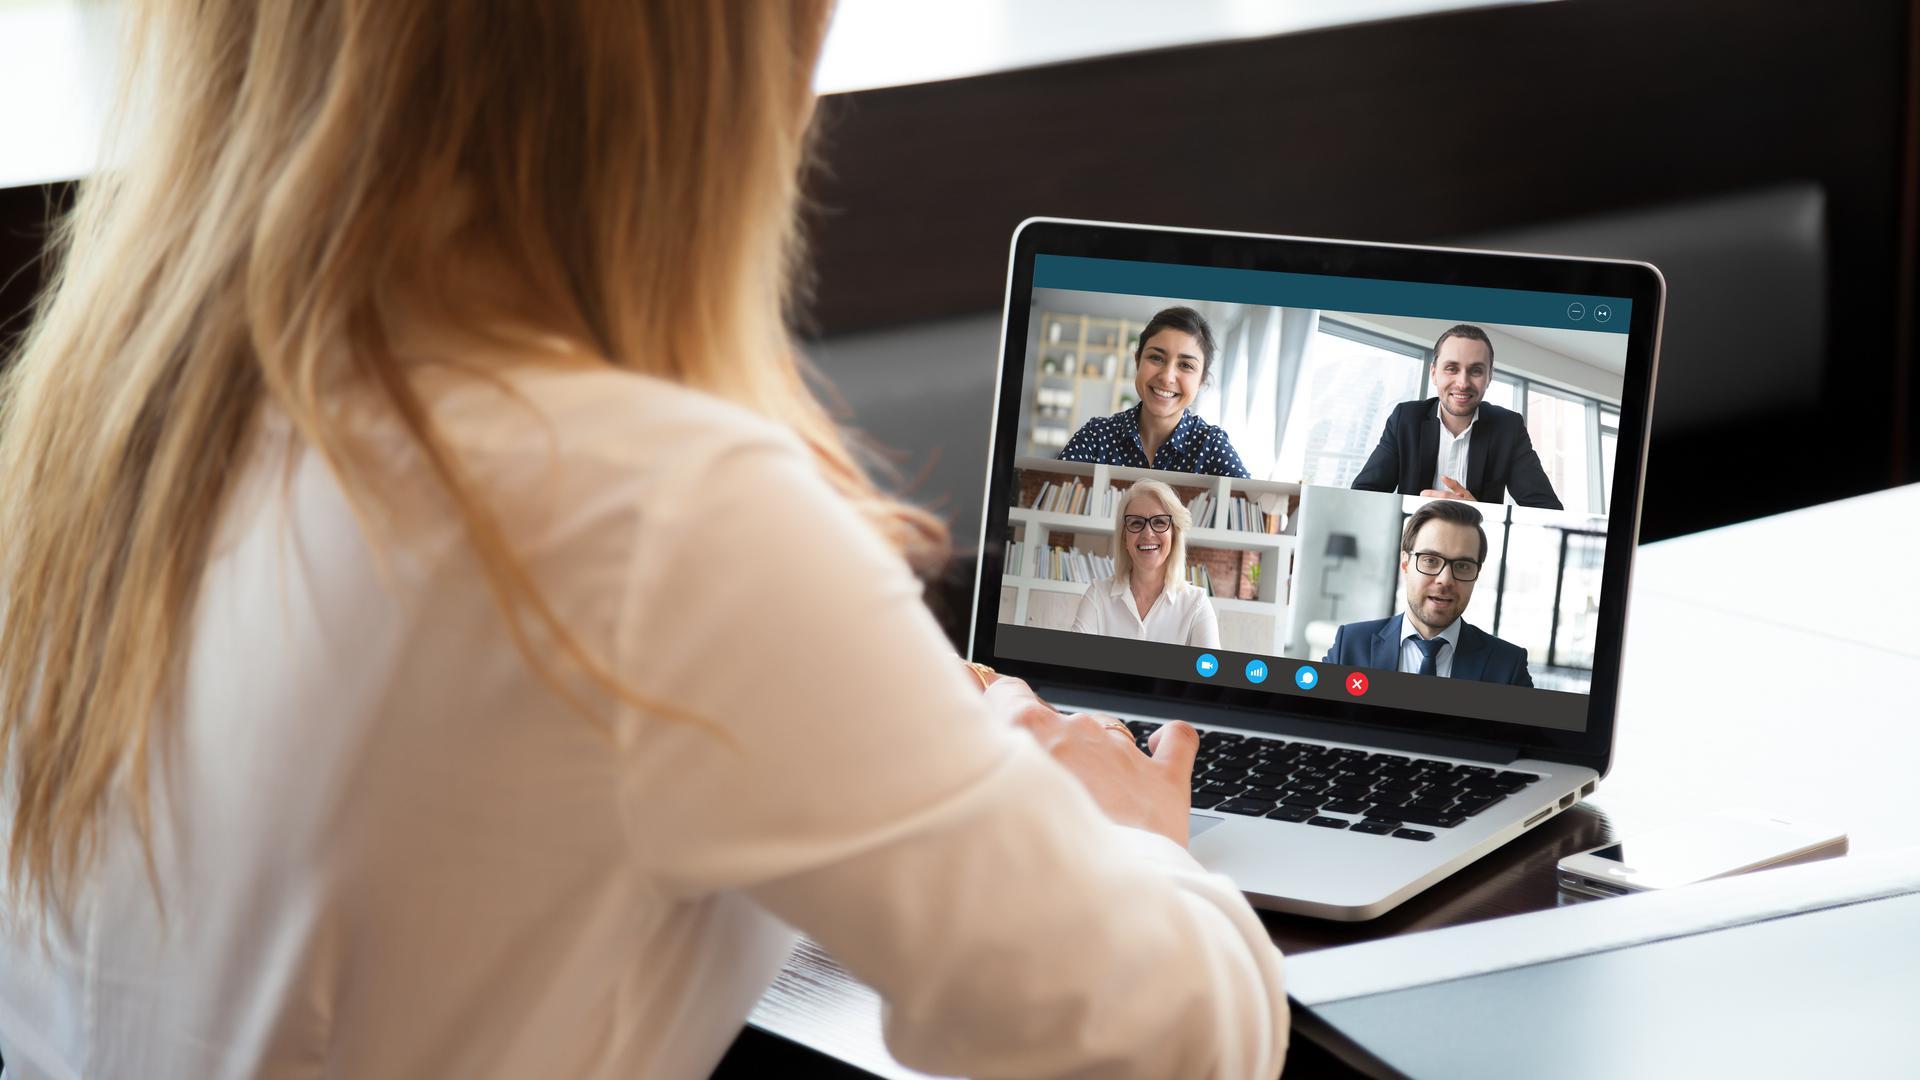 Bewerbungsgespräch per Videokonferenz.